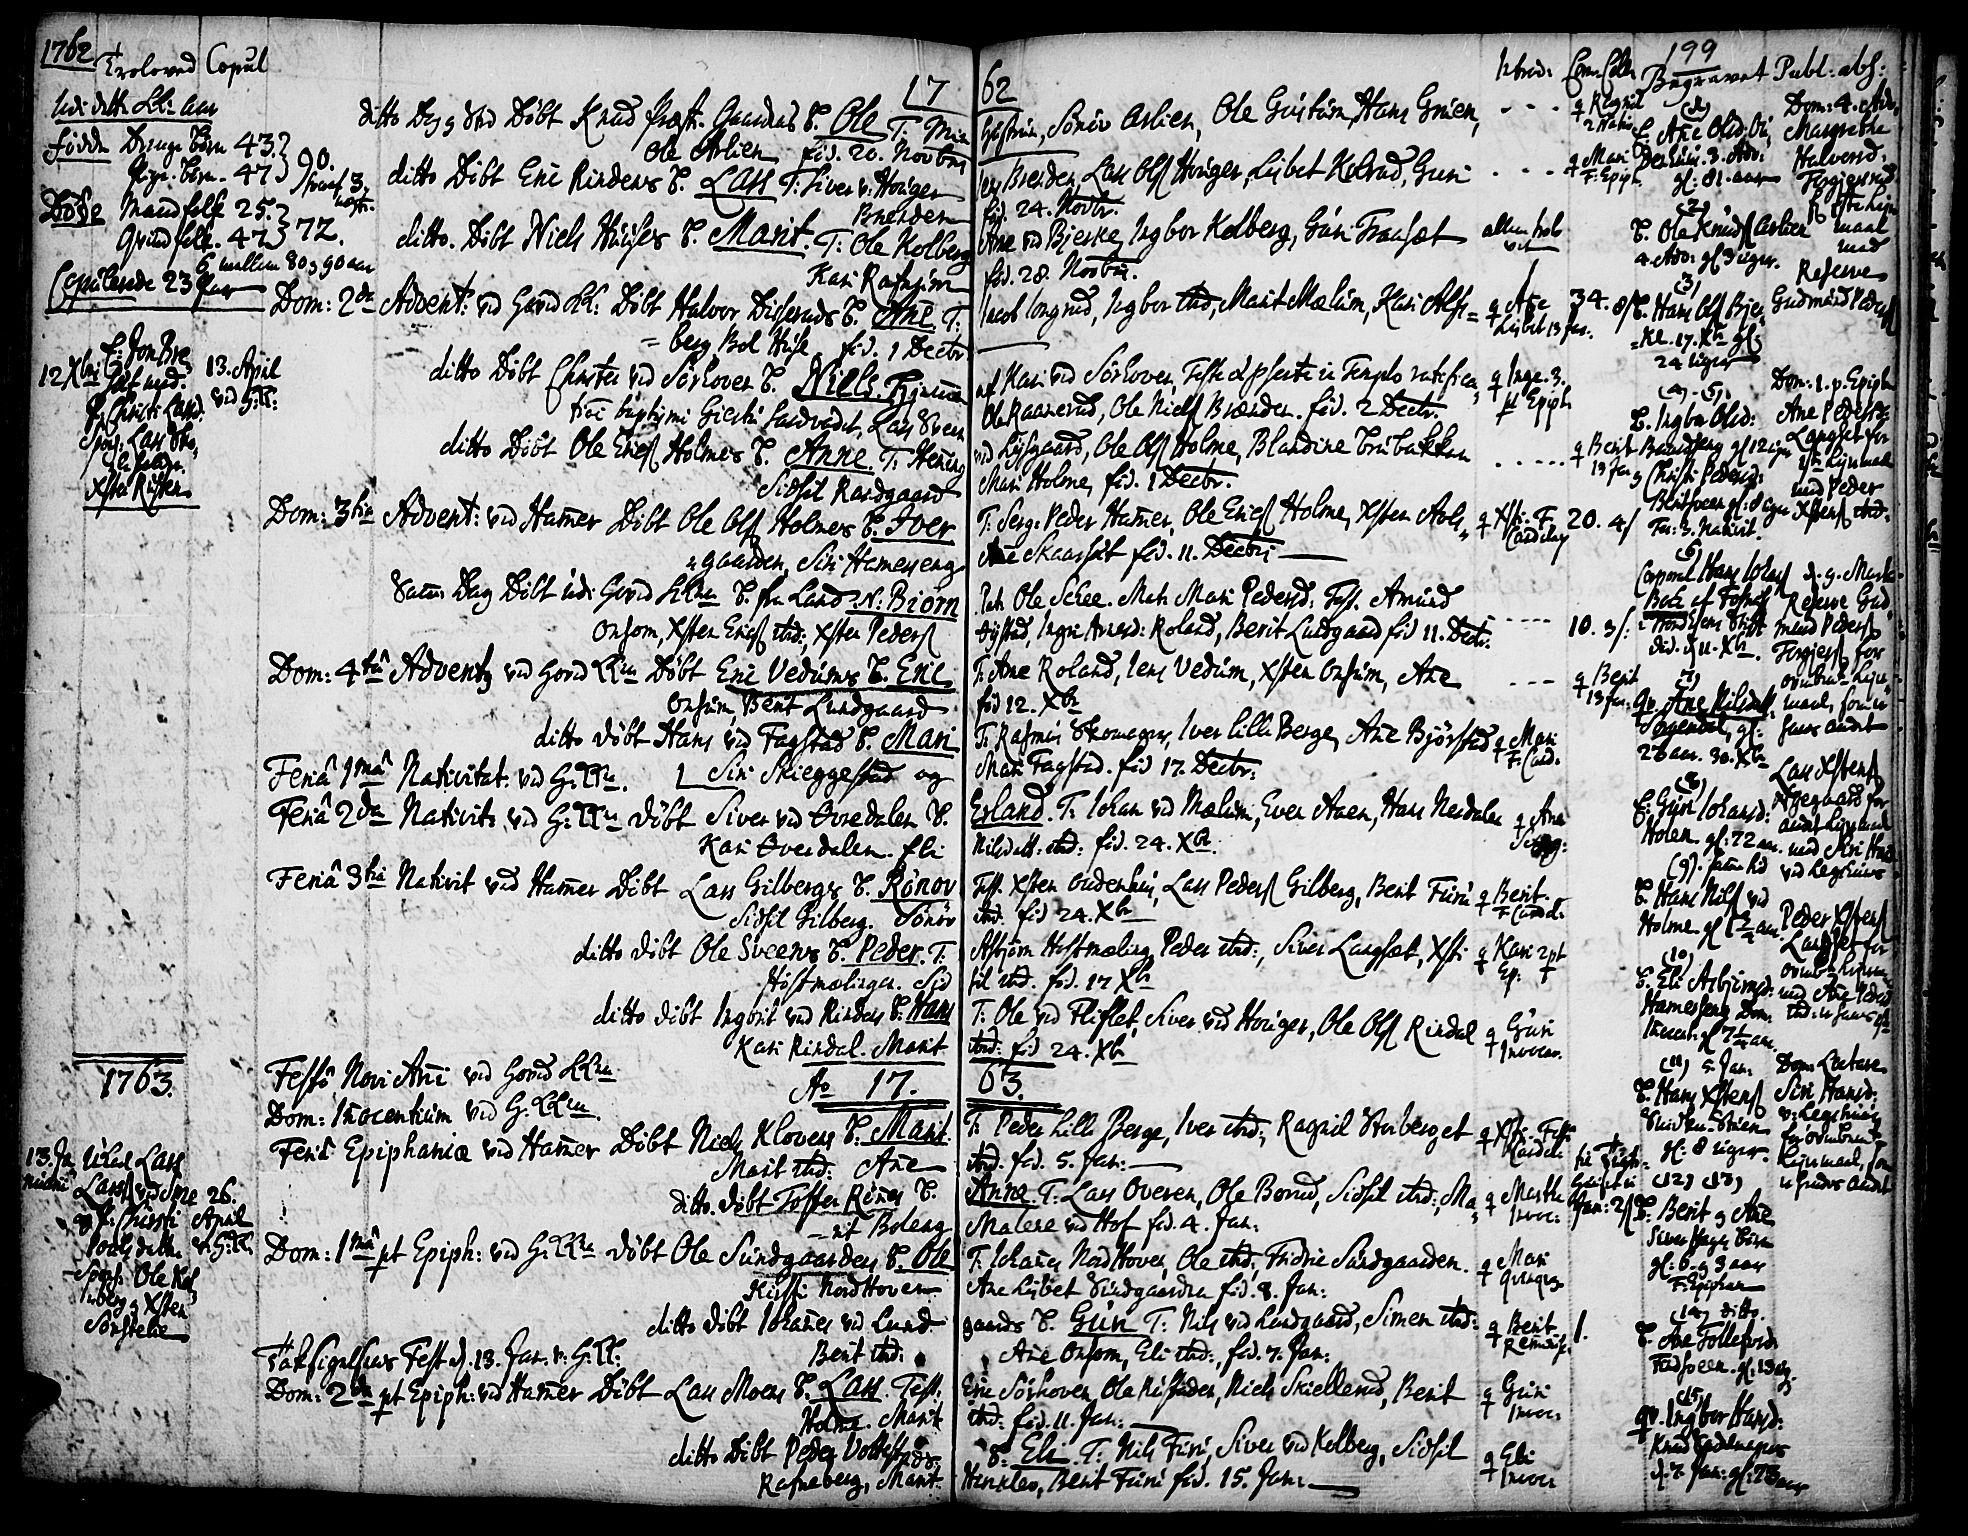 SAH, Fåberg prestekontor, Ministerialbok nr. 1, 1727-1775, s. 199